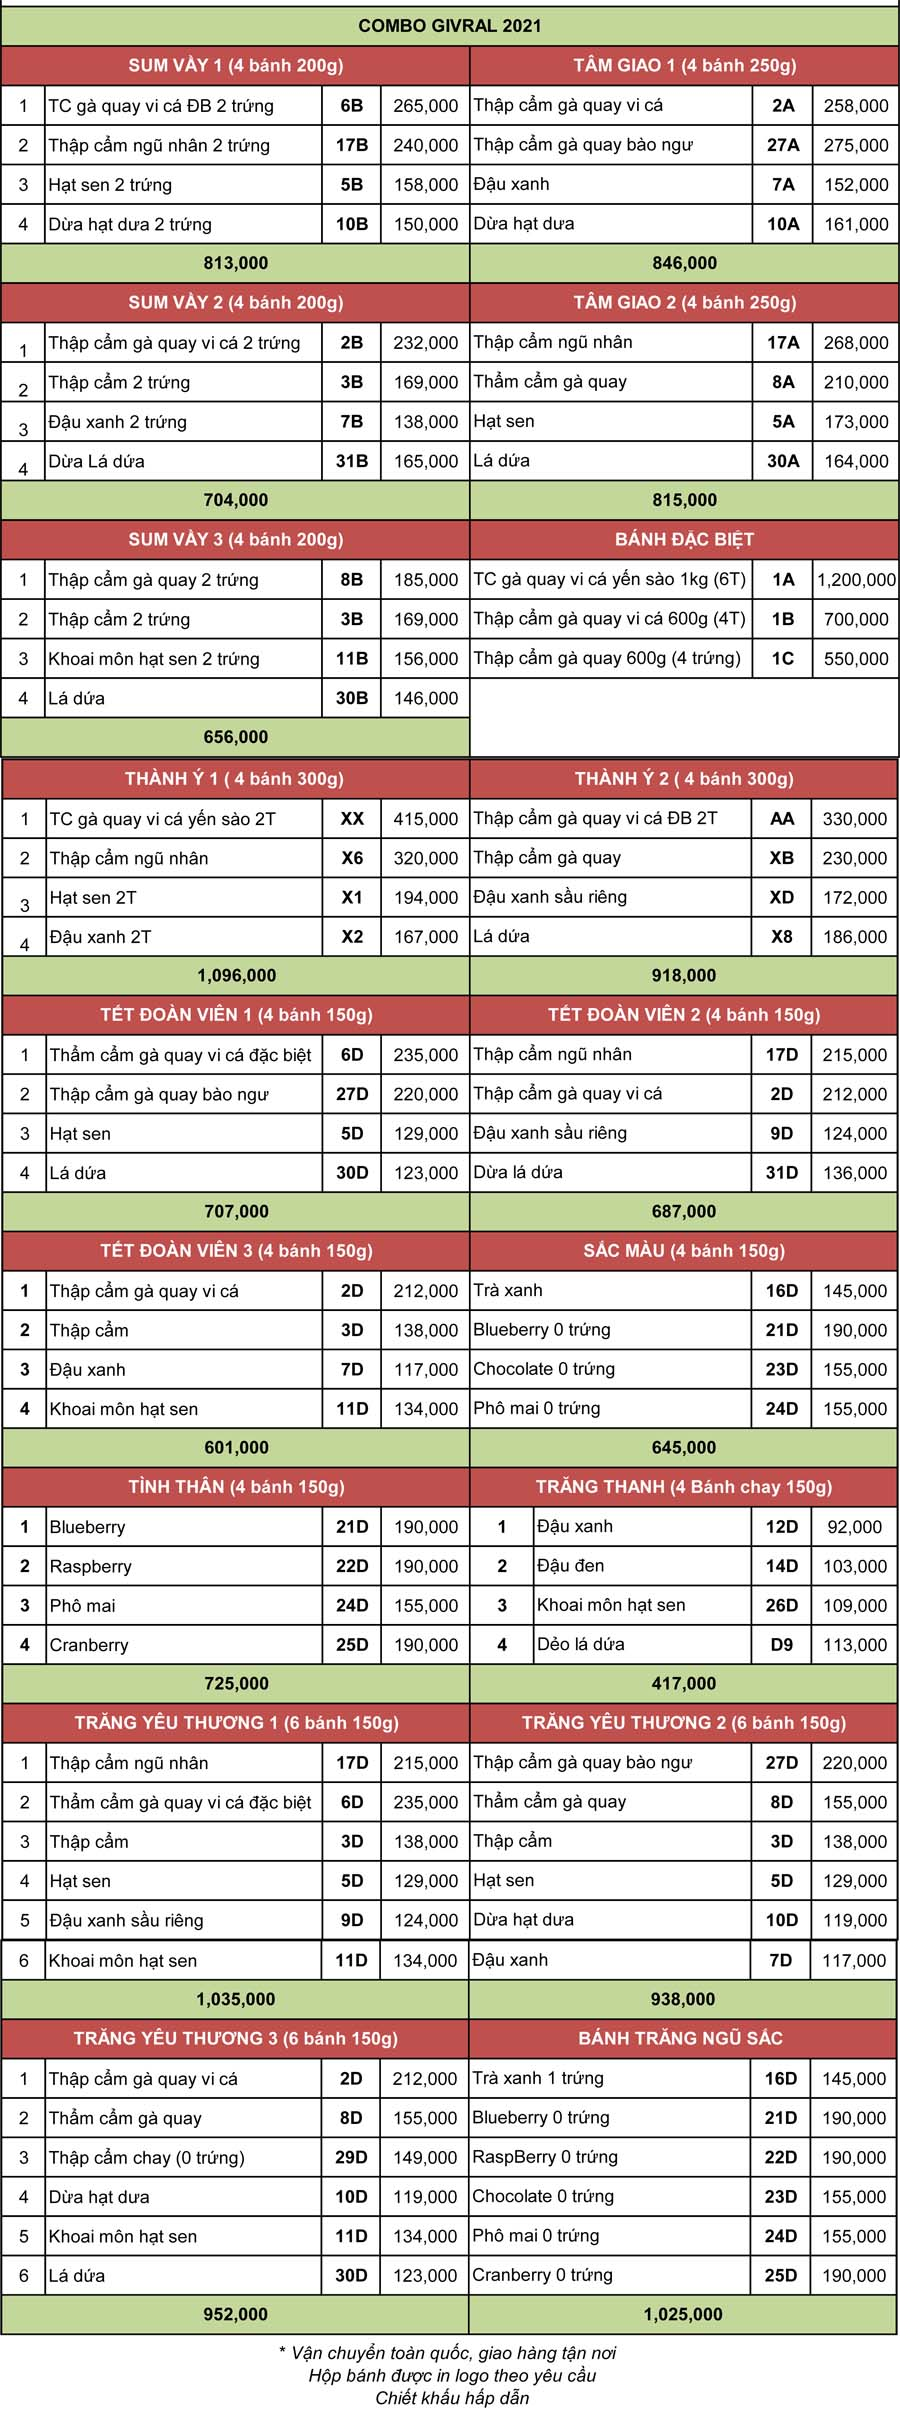 Giá combo givral 2021